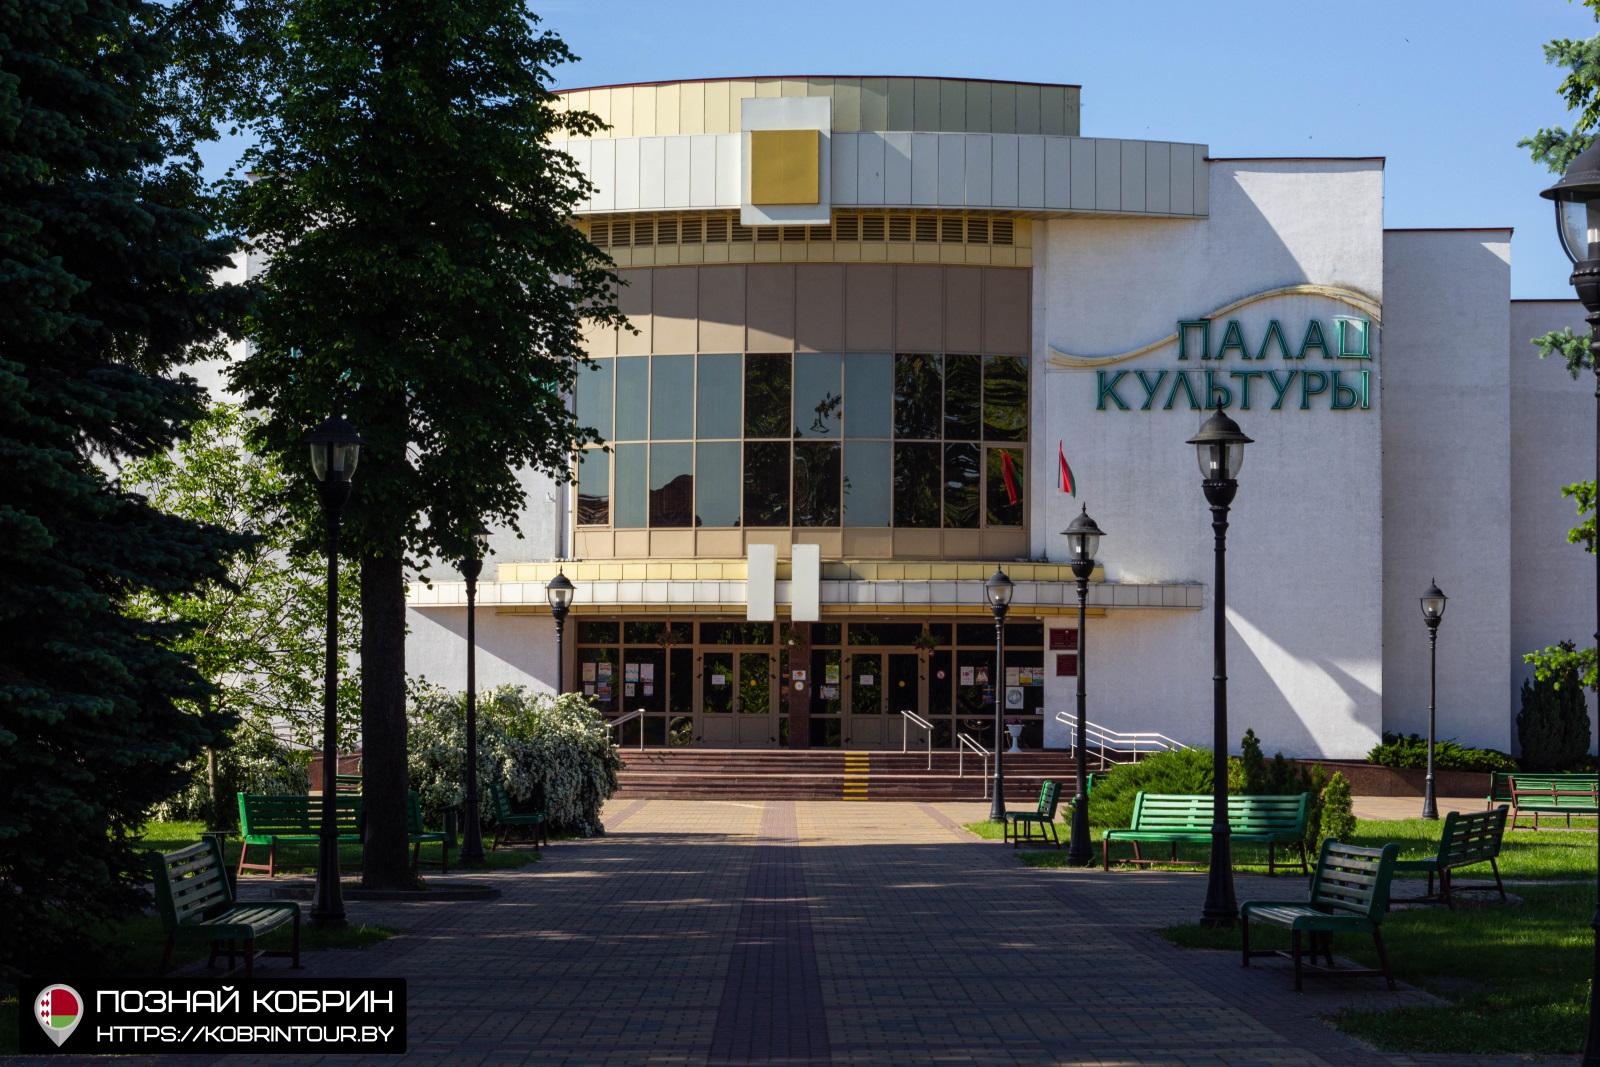 Кобринский Дворец культуры